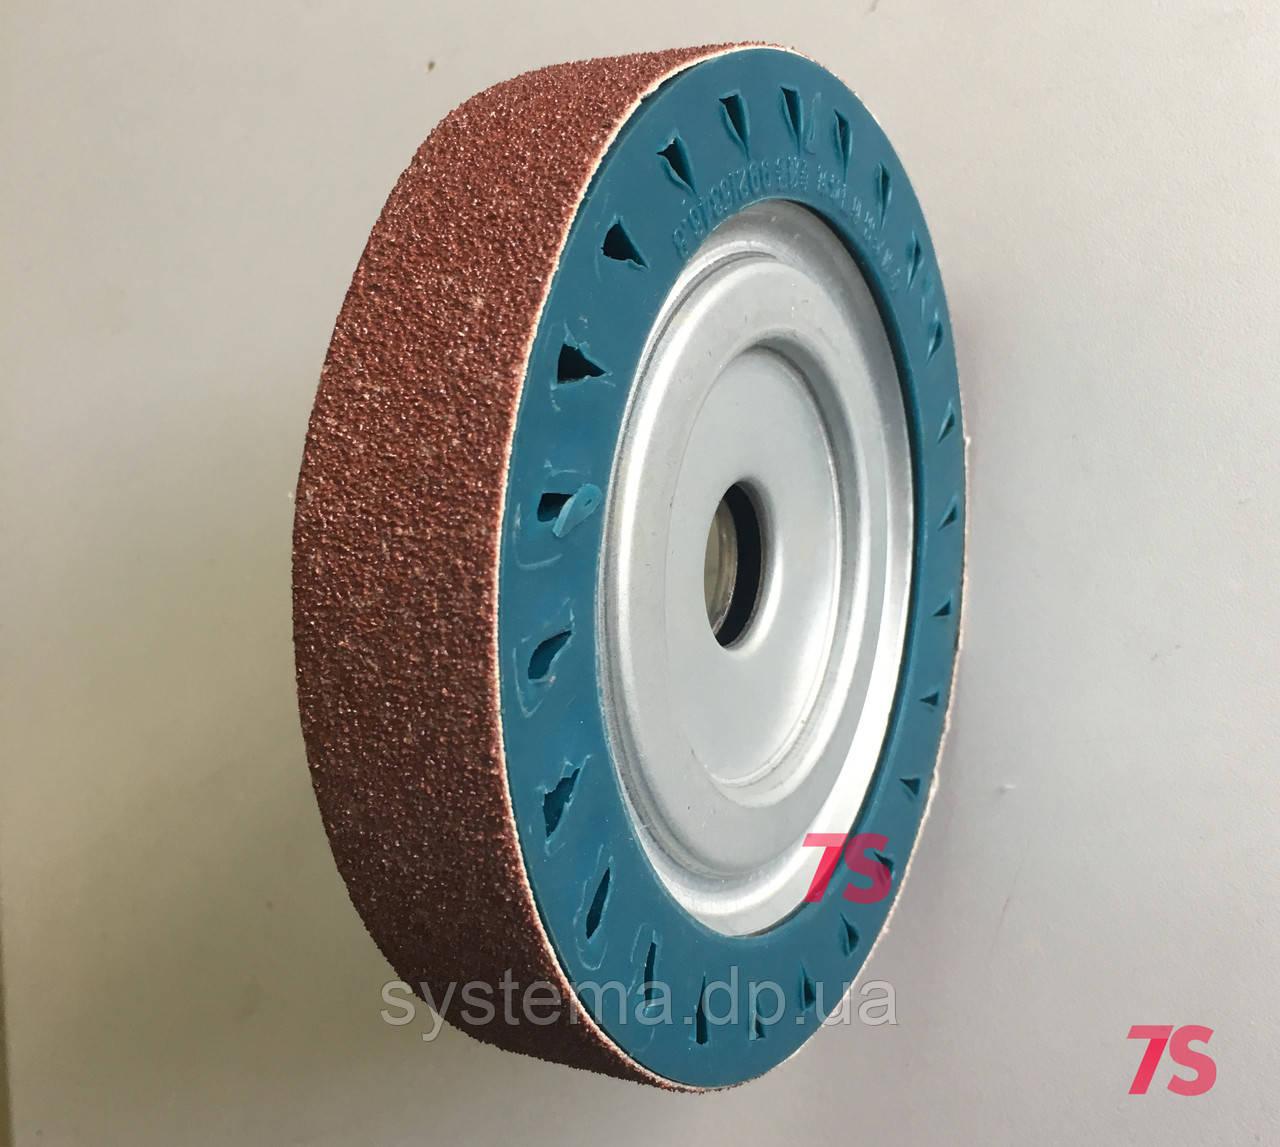 Шлифовальный барабан д. 150х30х25,4 мм, для лент 30х471-475 мм, расширяющийся от вращения